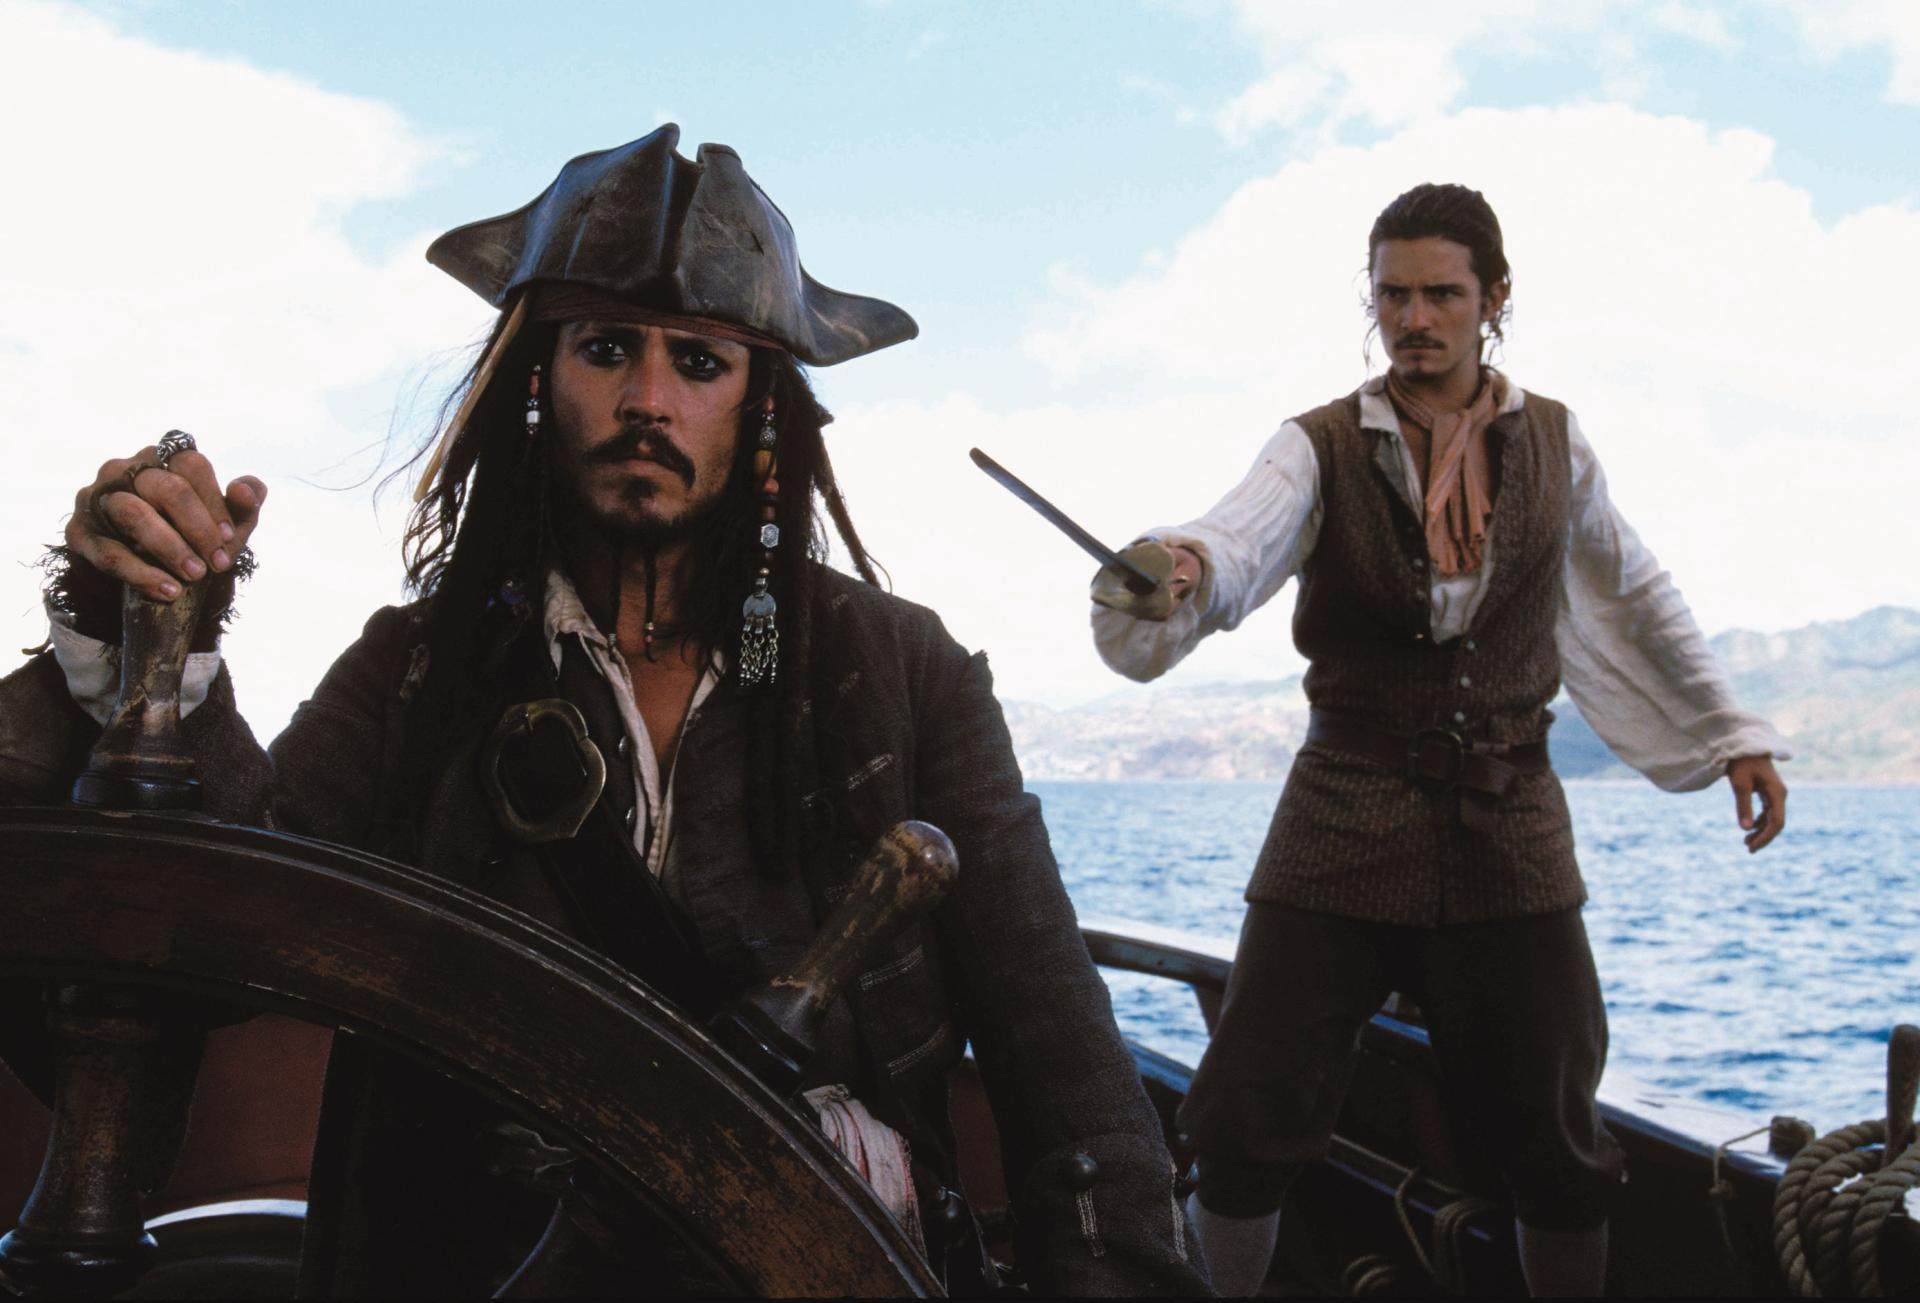 pirates of the carrabean essay